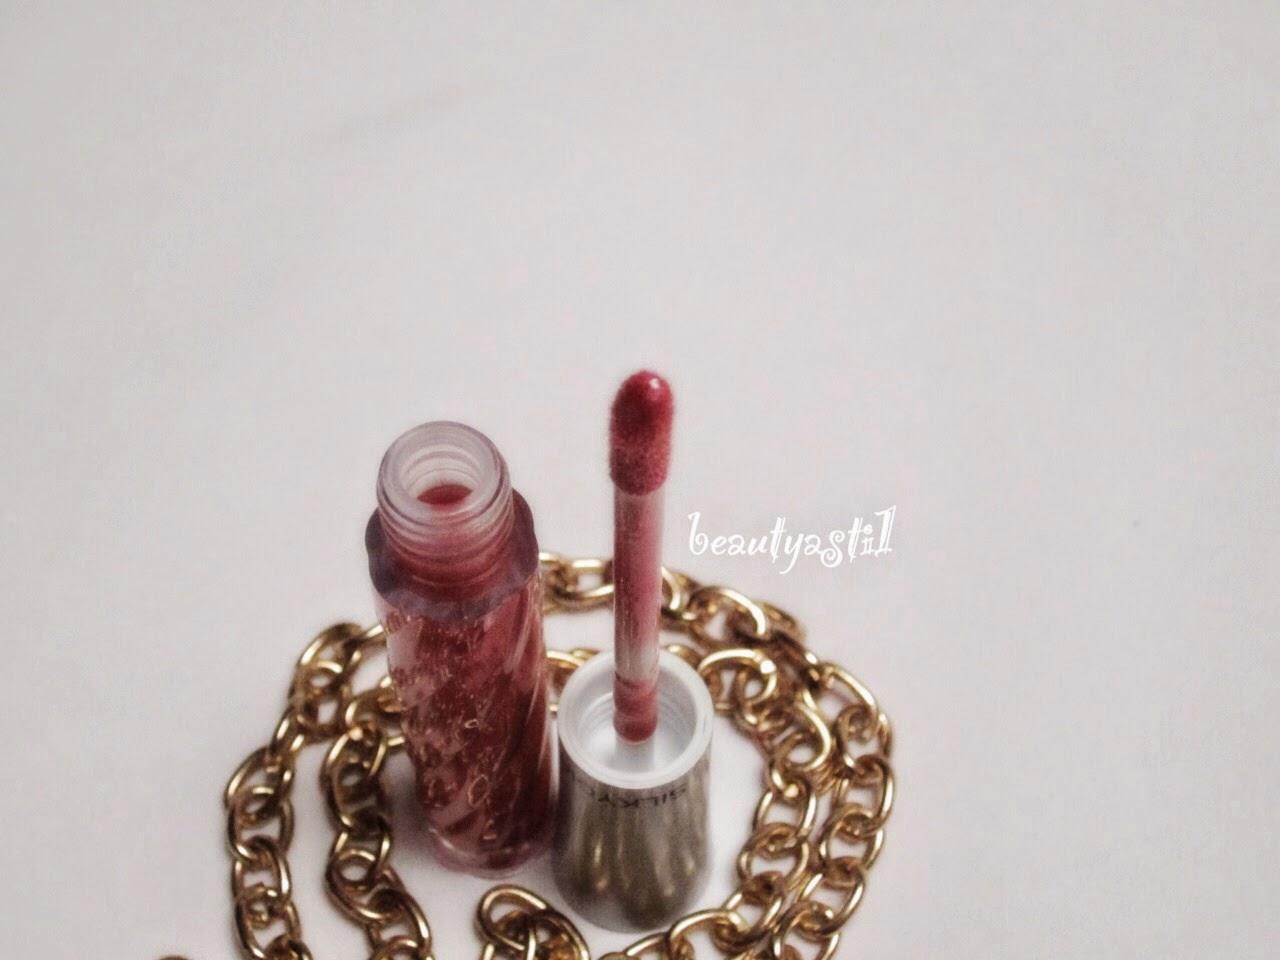 swatch-warna-silkygirl-moisture-lipgloss-03-dazzling-pink.jpg